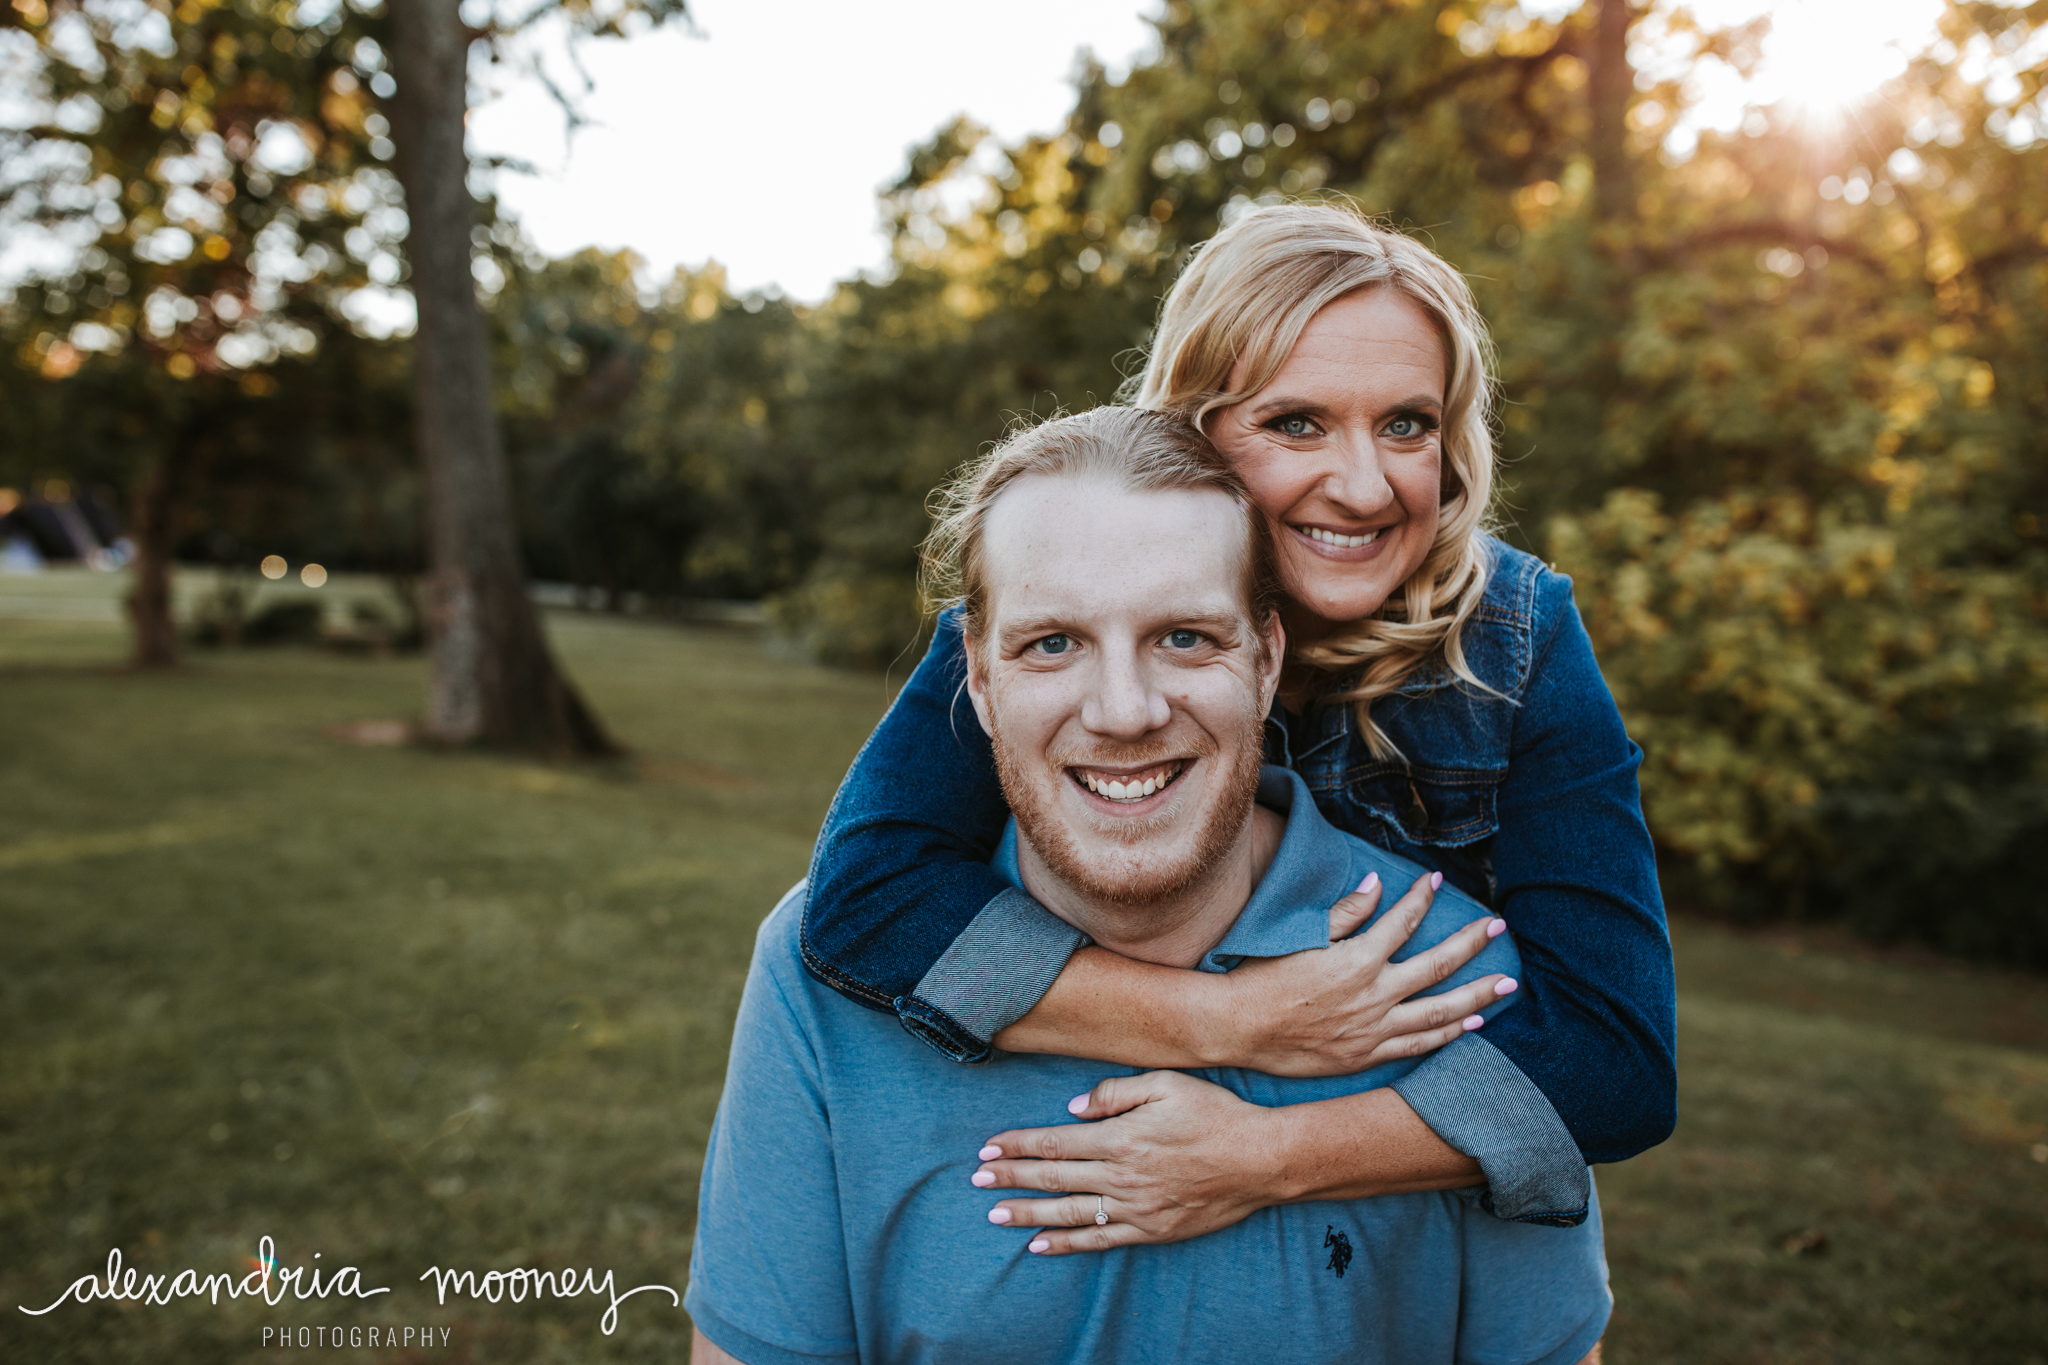 Tina_and_Jake_WATERMARKED-11.jpg